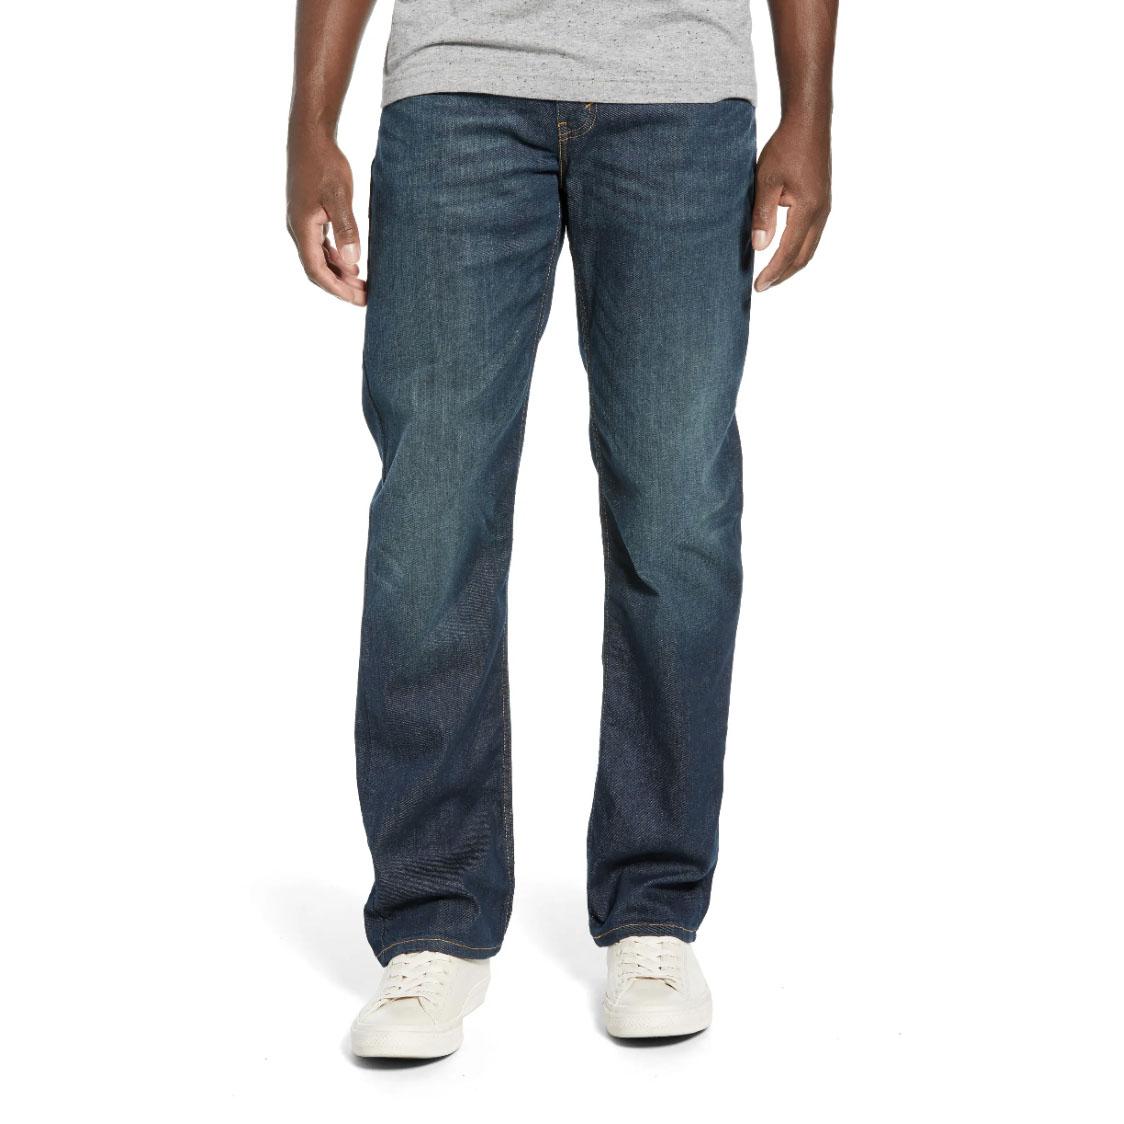 Levi's 514™ Straight Leg Jeans